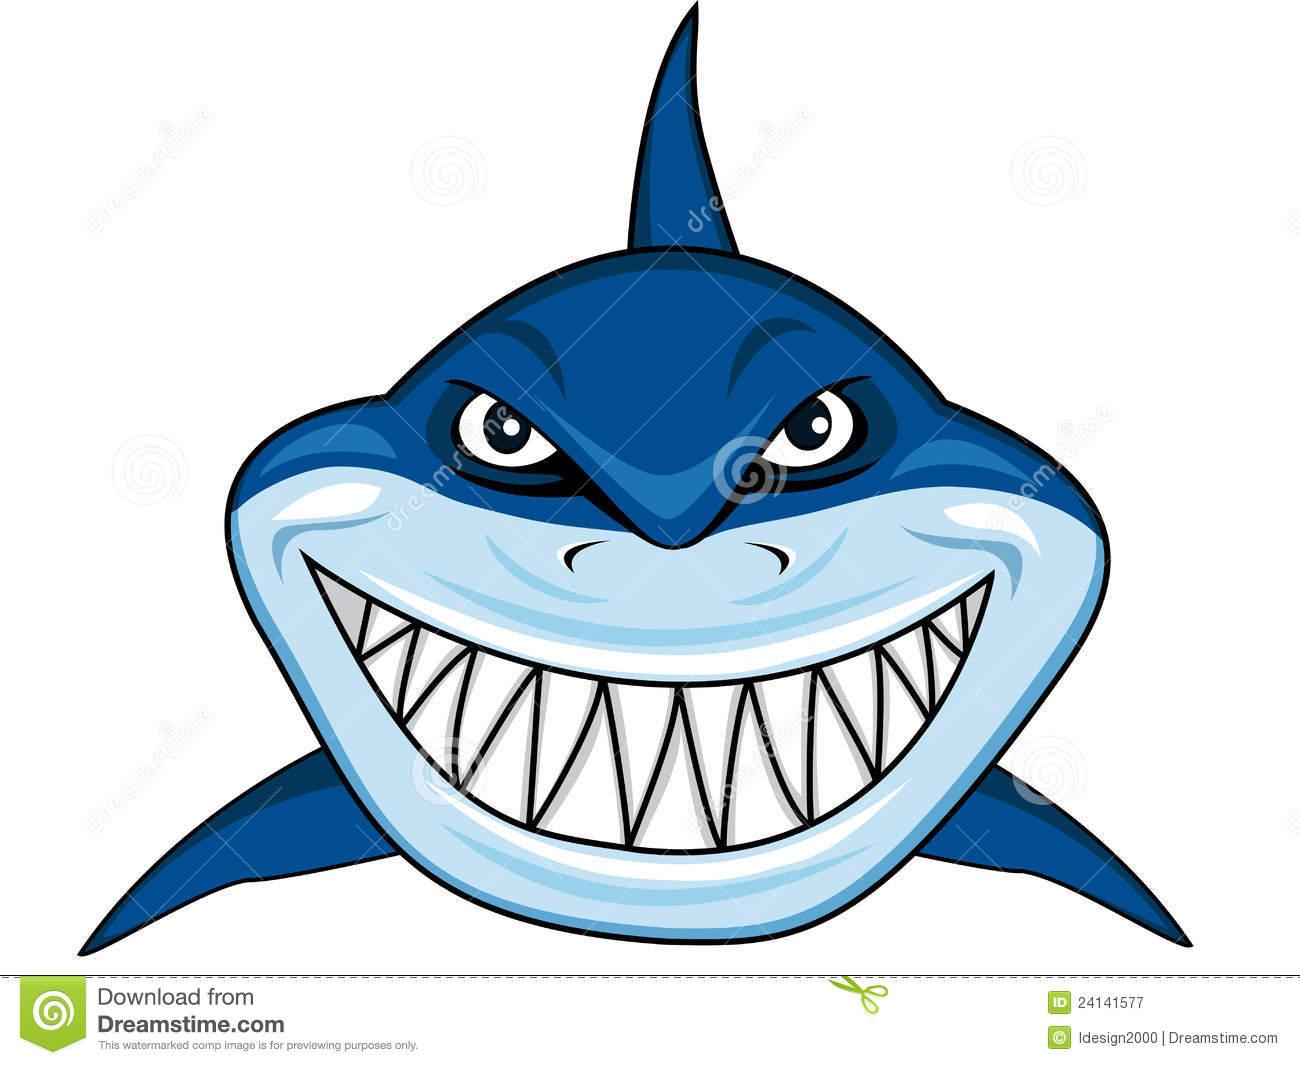 Clip Art Sharks Clipart cartoon shark clipart kid royalty free stock photography smiling image 24141577